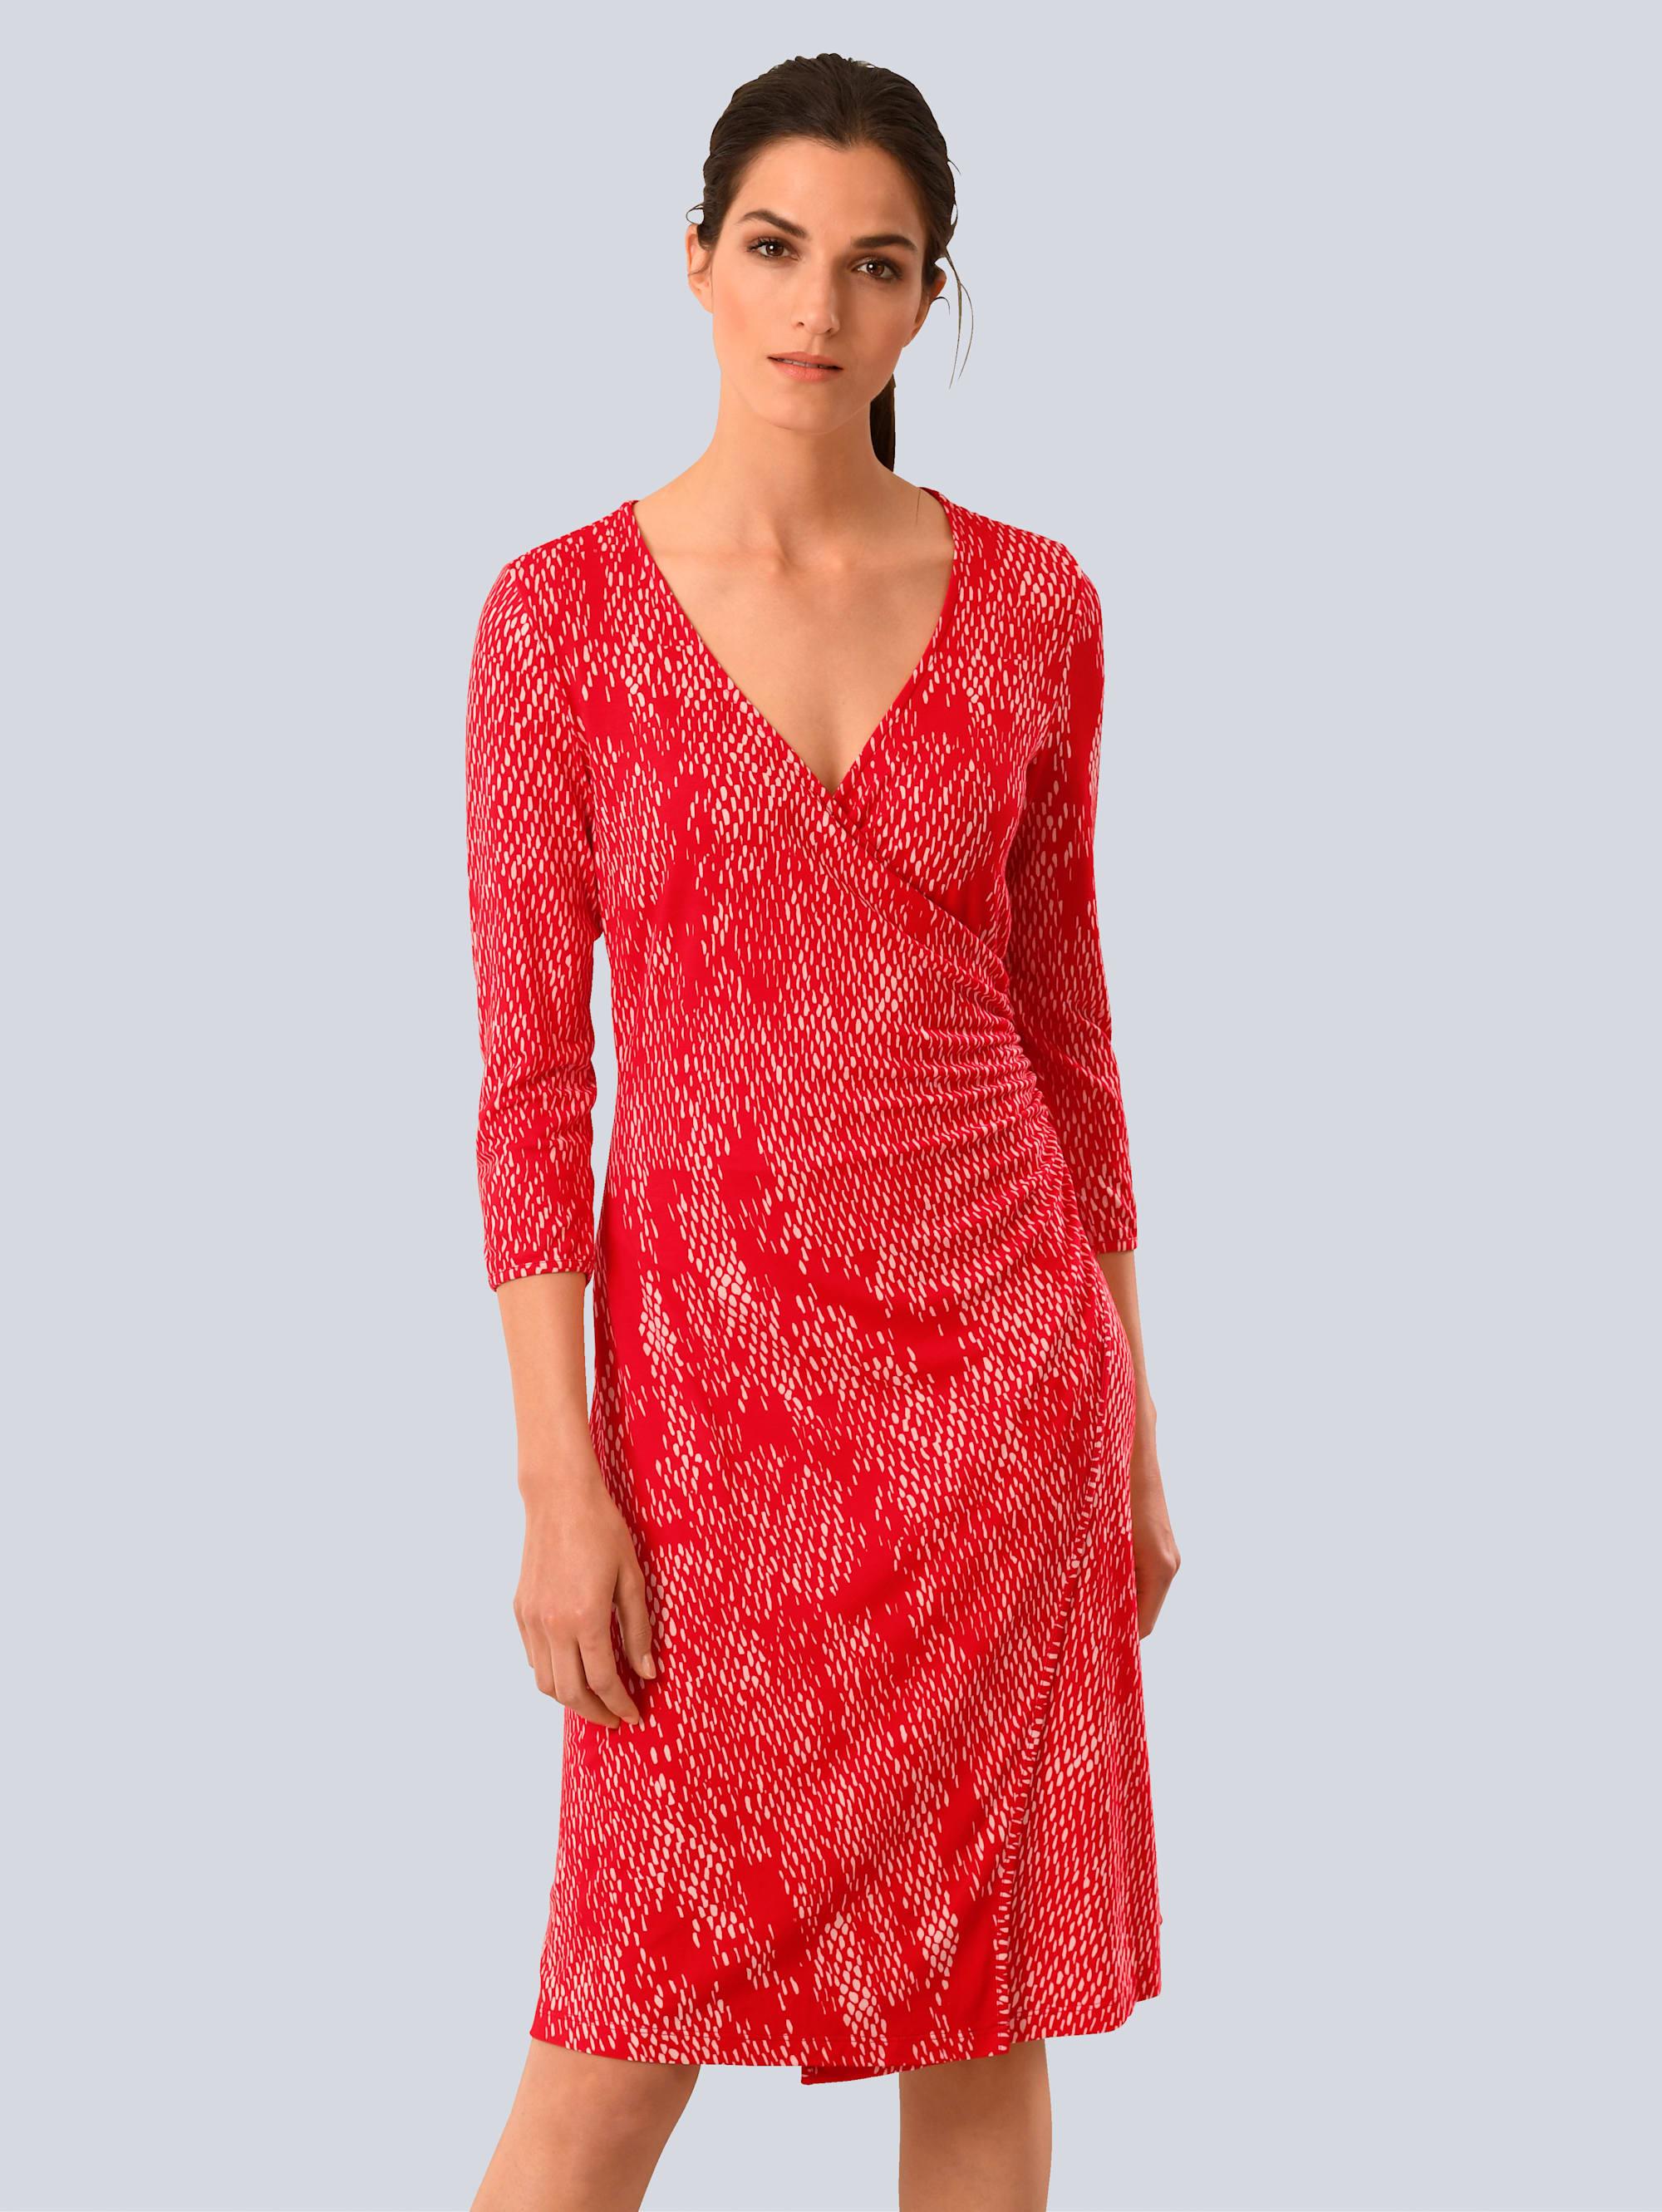 Alba Moda Wickelkleid rot Damen Wickelkleider Kleider